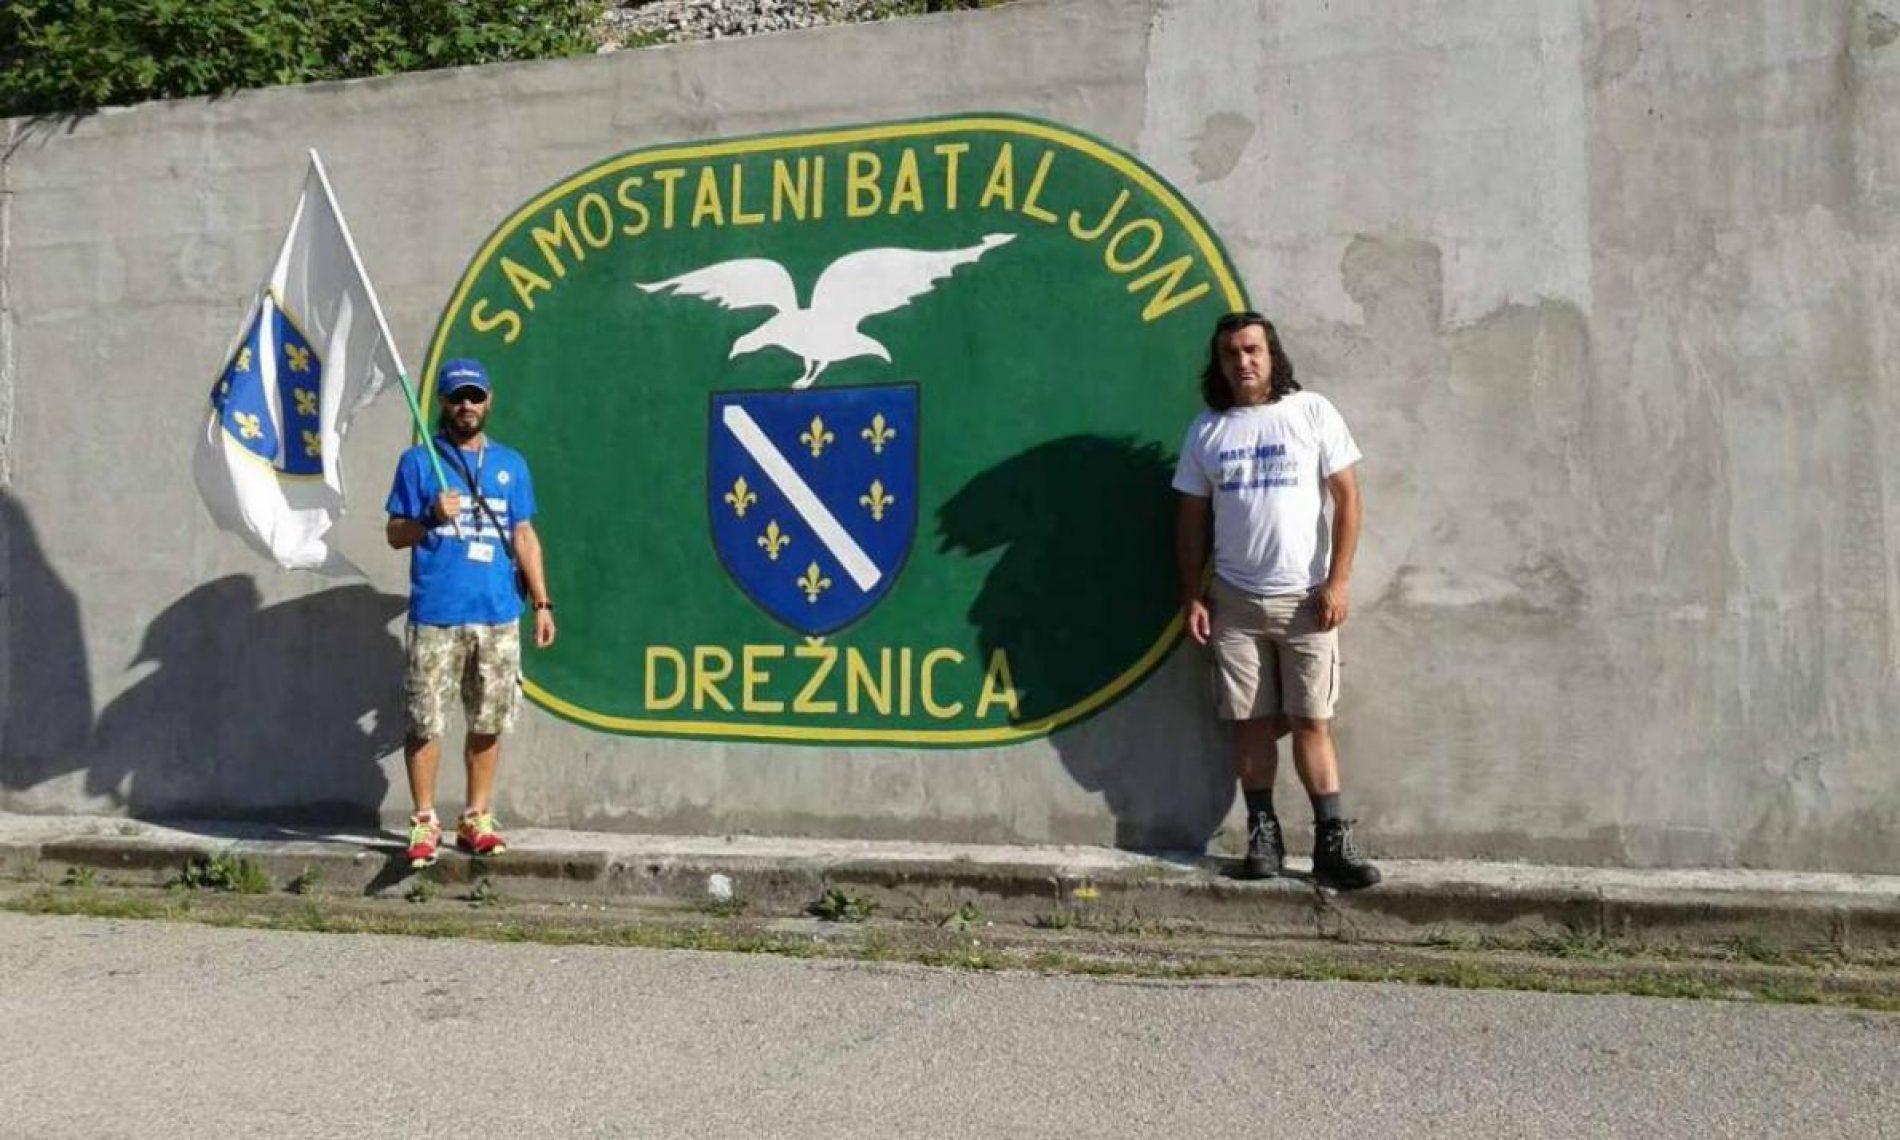 Marš mira: Iz Drežnice krenuli pješice ka Srebrenici